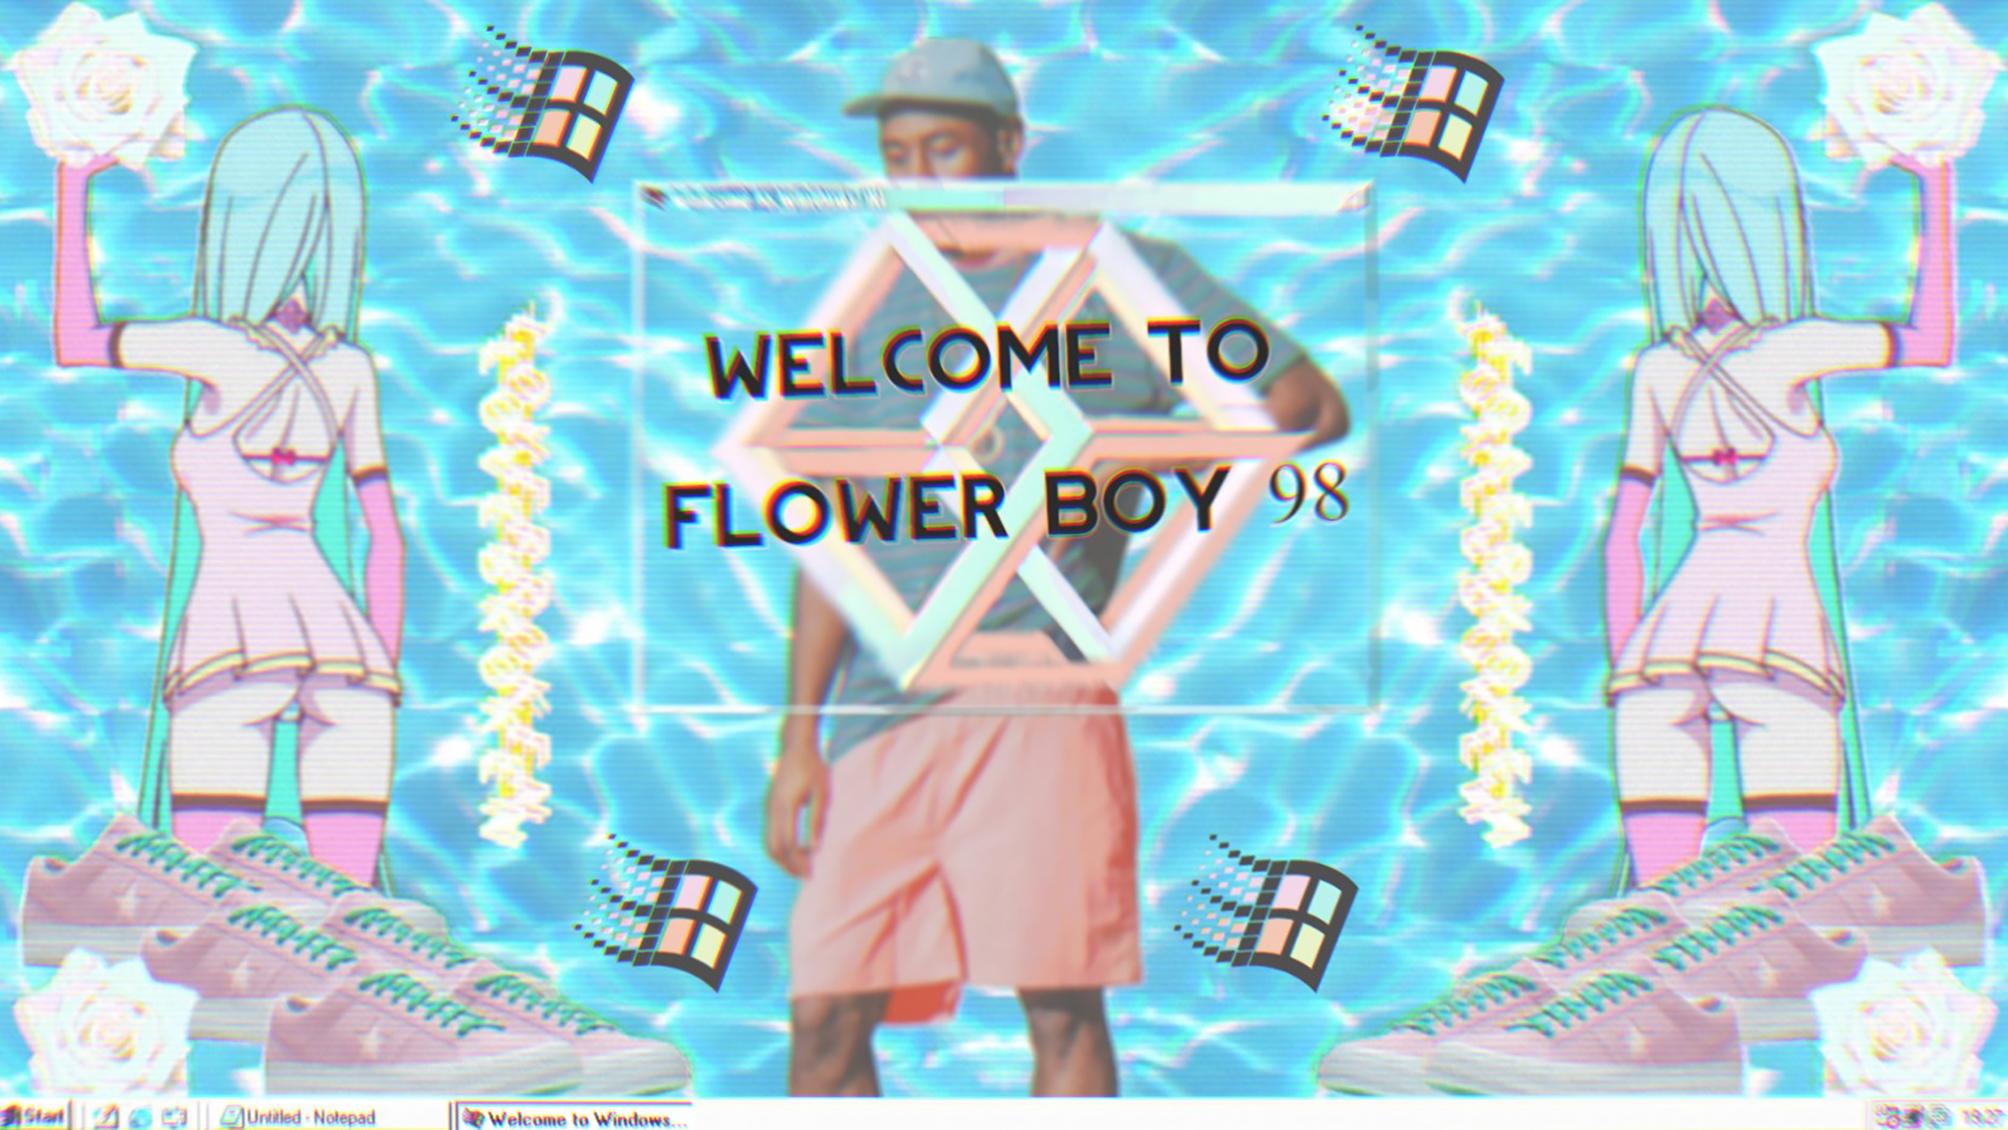 Flower Boy 98 by THEAESTHETICWEEB